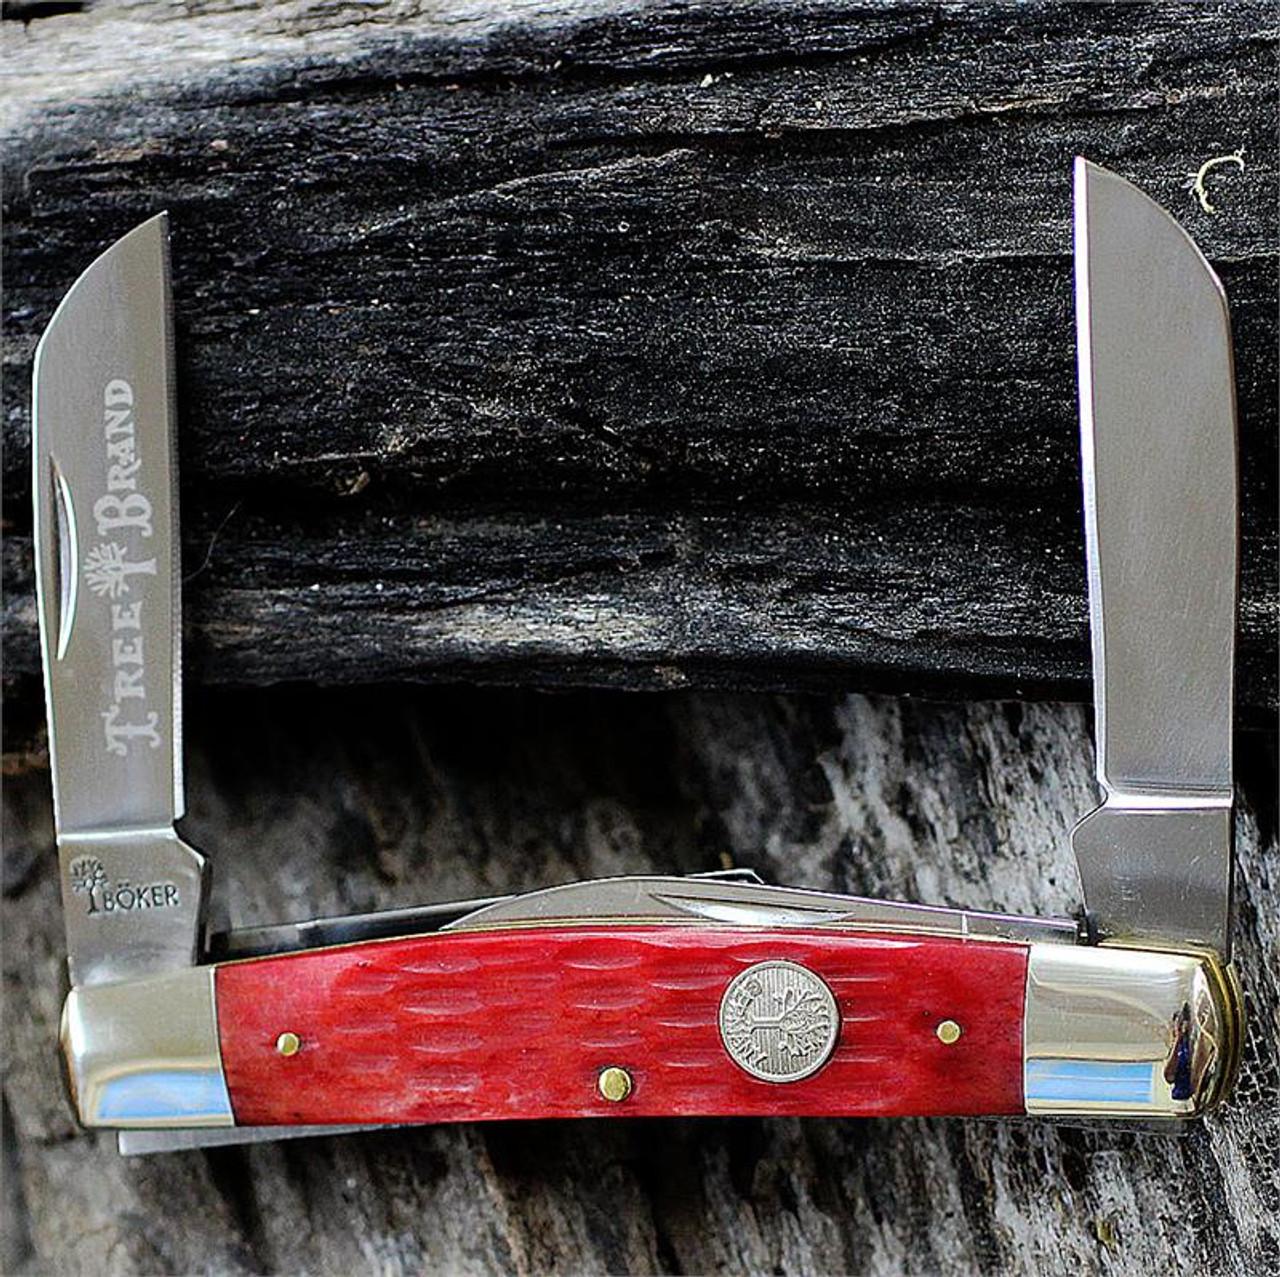 Boker 110745 Traditional Series Congress, Red Jigged Bone Handle